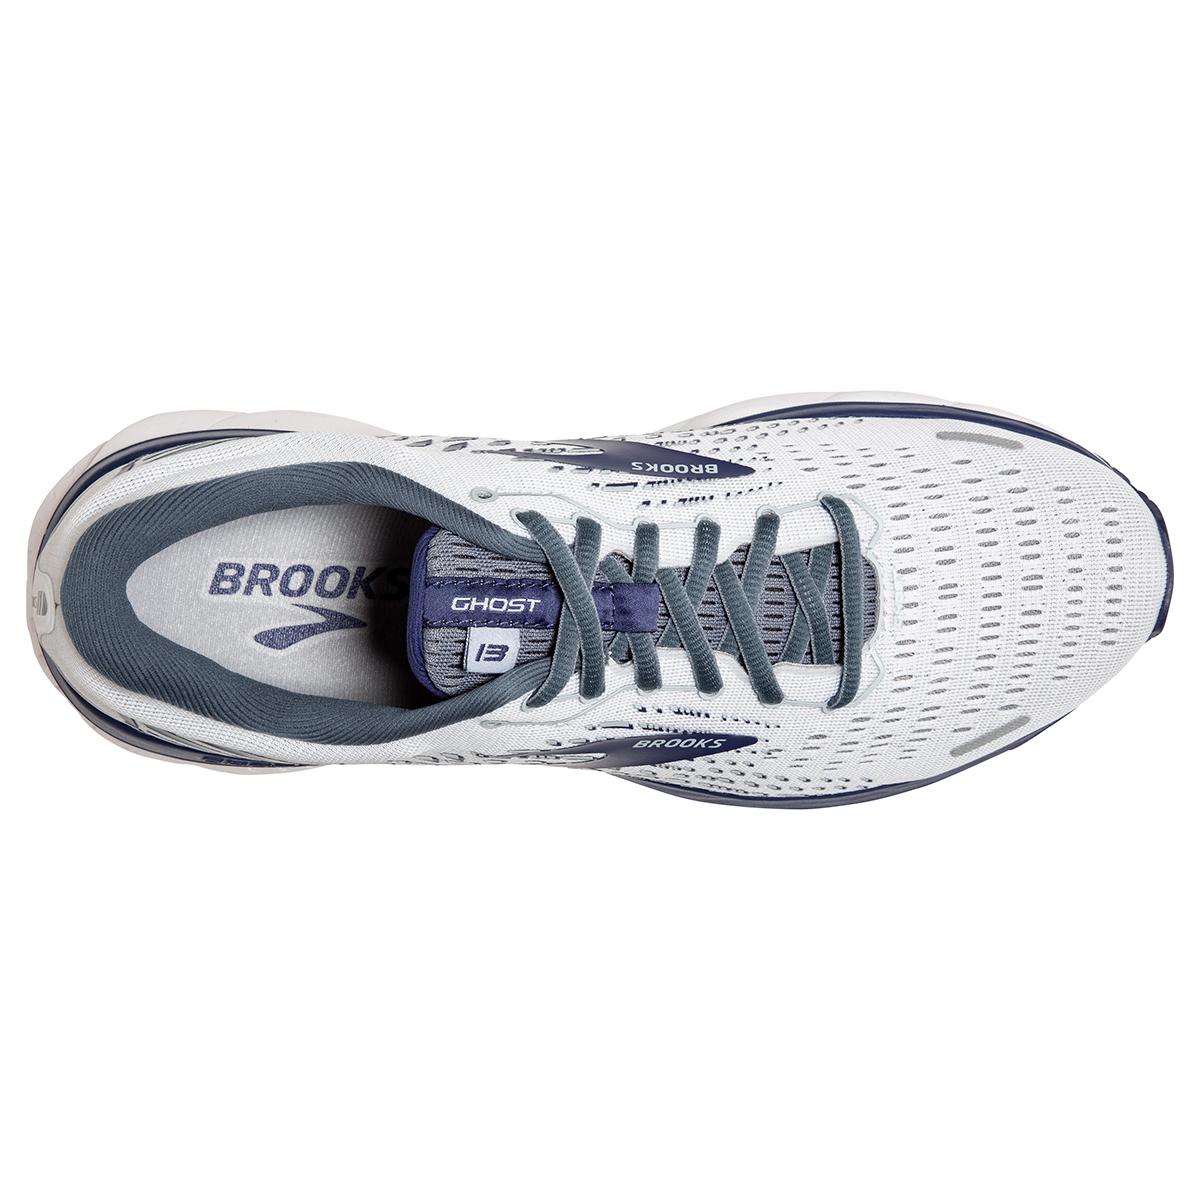 Men's Brooks Ghost 13 Running Shoe - Color: White/Grey/Deep Cobalt - Size: 7 - Width: Extra Wide, White/Grey/Deep Cobalt, large, image 2